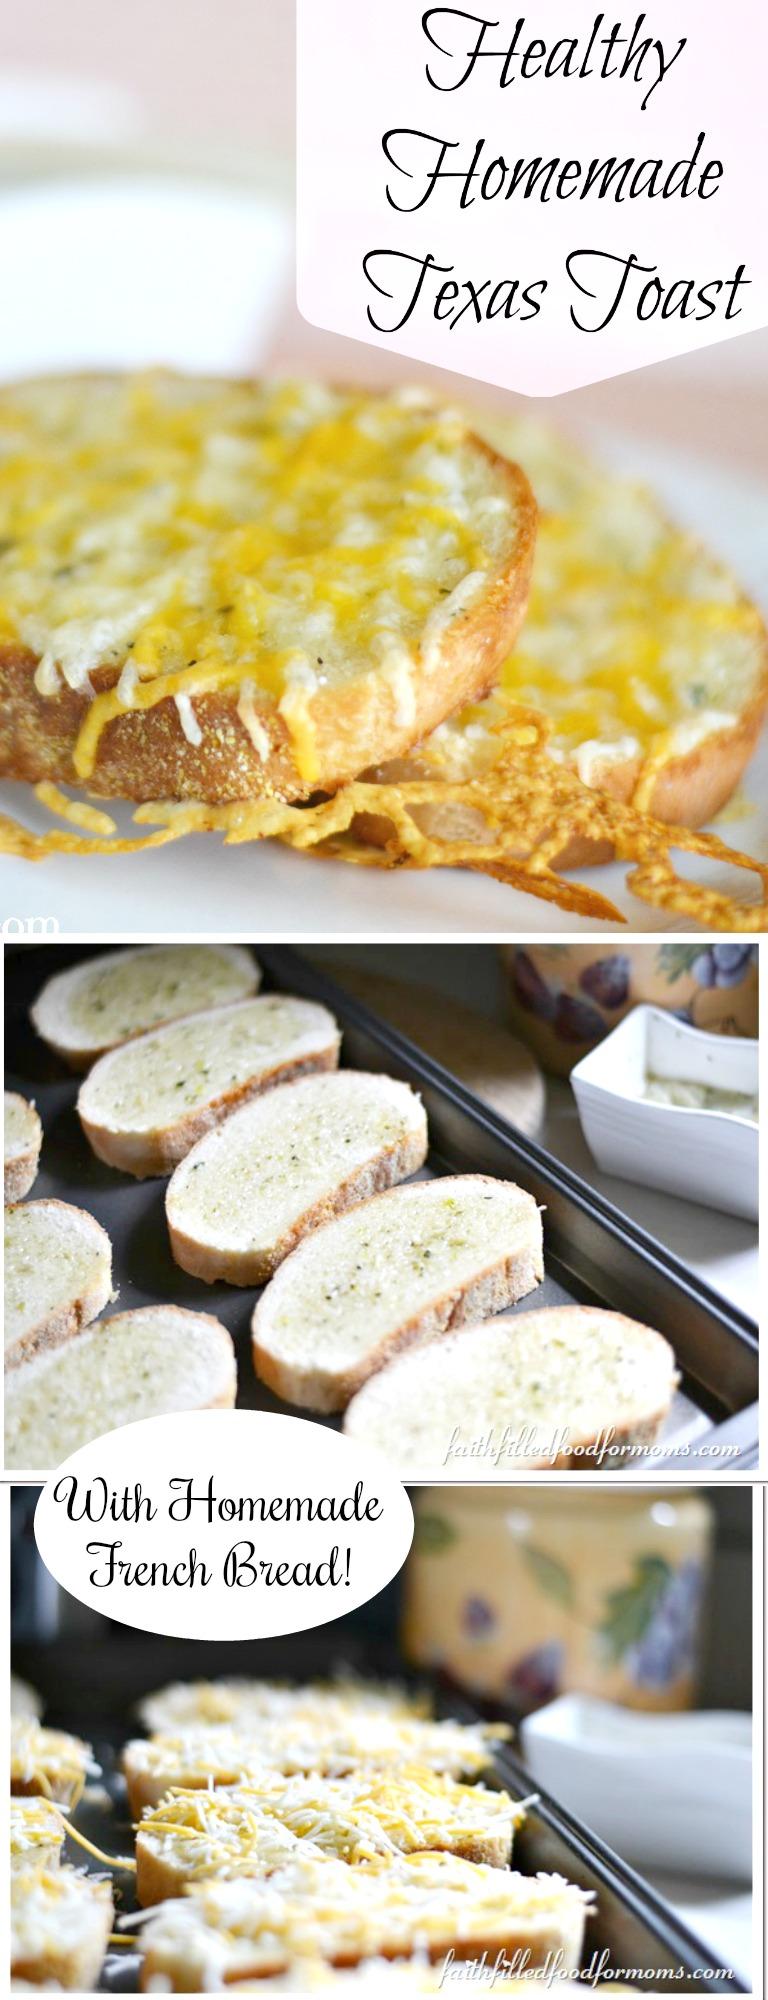 Healthy Homemade Texas Toast